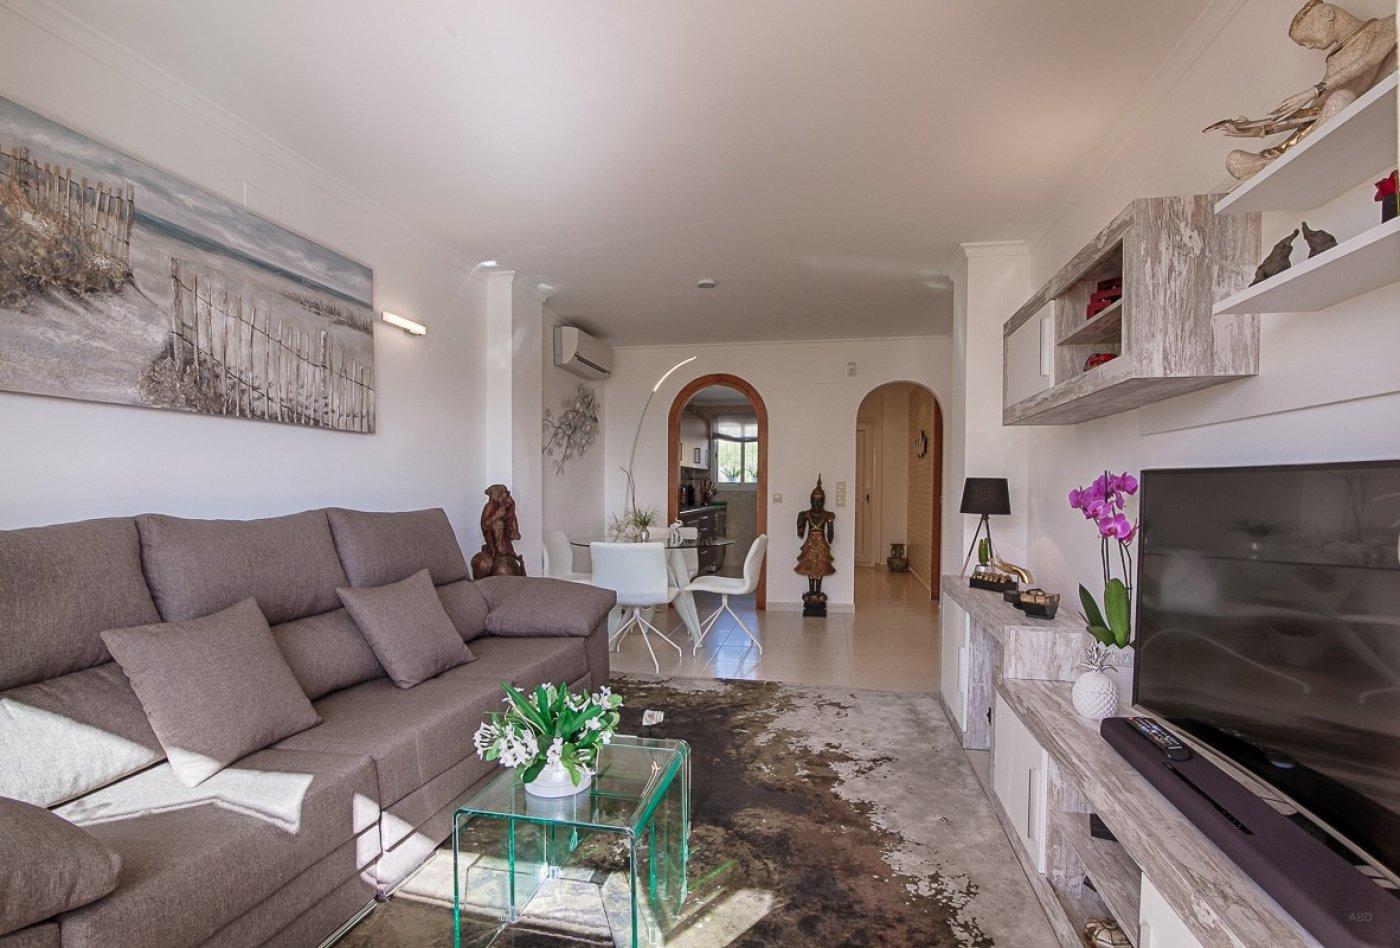 Apartment - Ready To Move And Live - CUMBRES DEL SOL - Benitachell